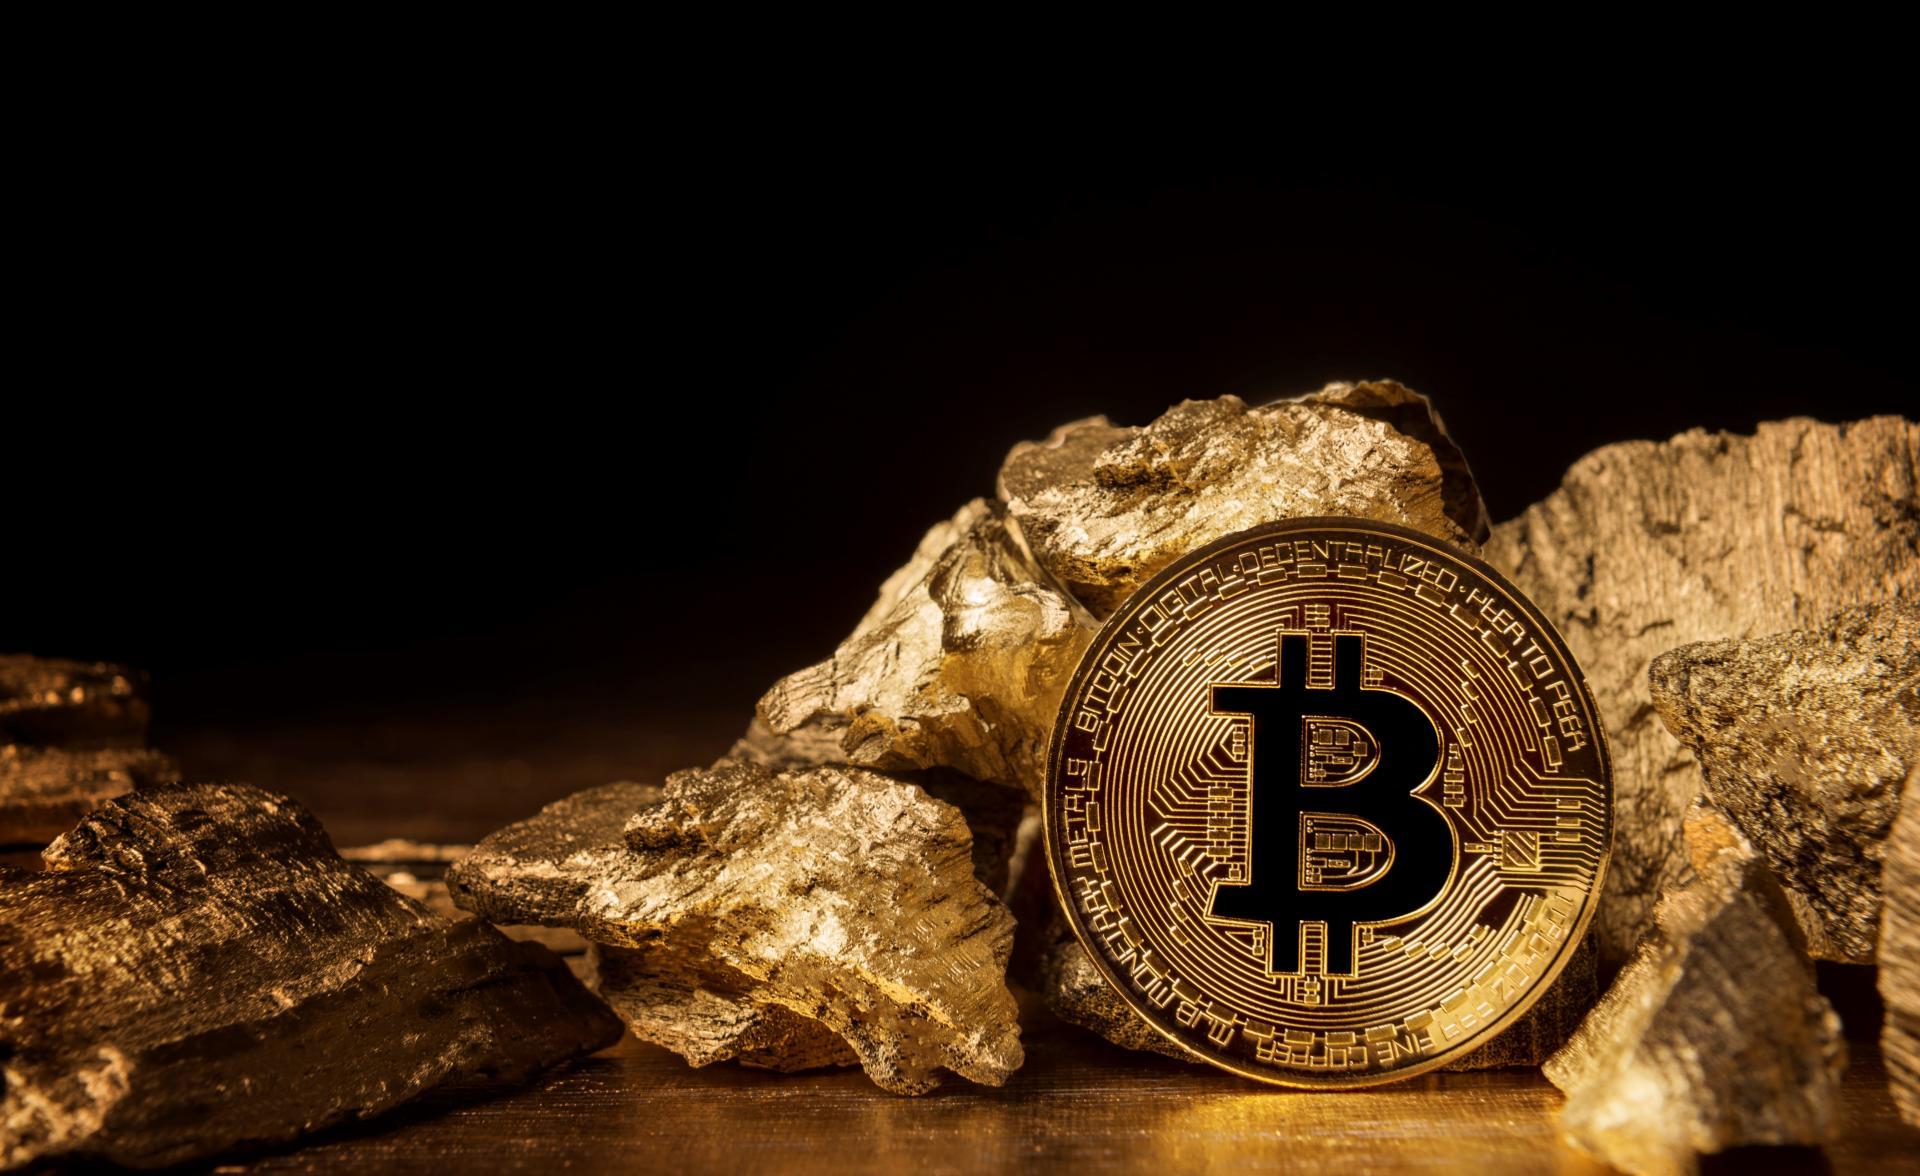 tona govedine bitcoin trgovac kako napisati bota za kripto trgovanje